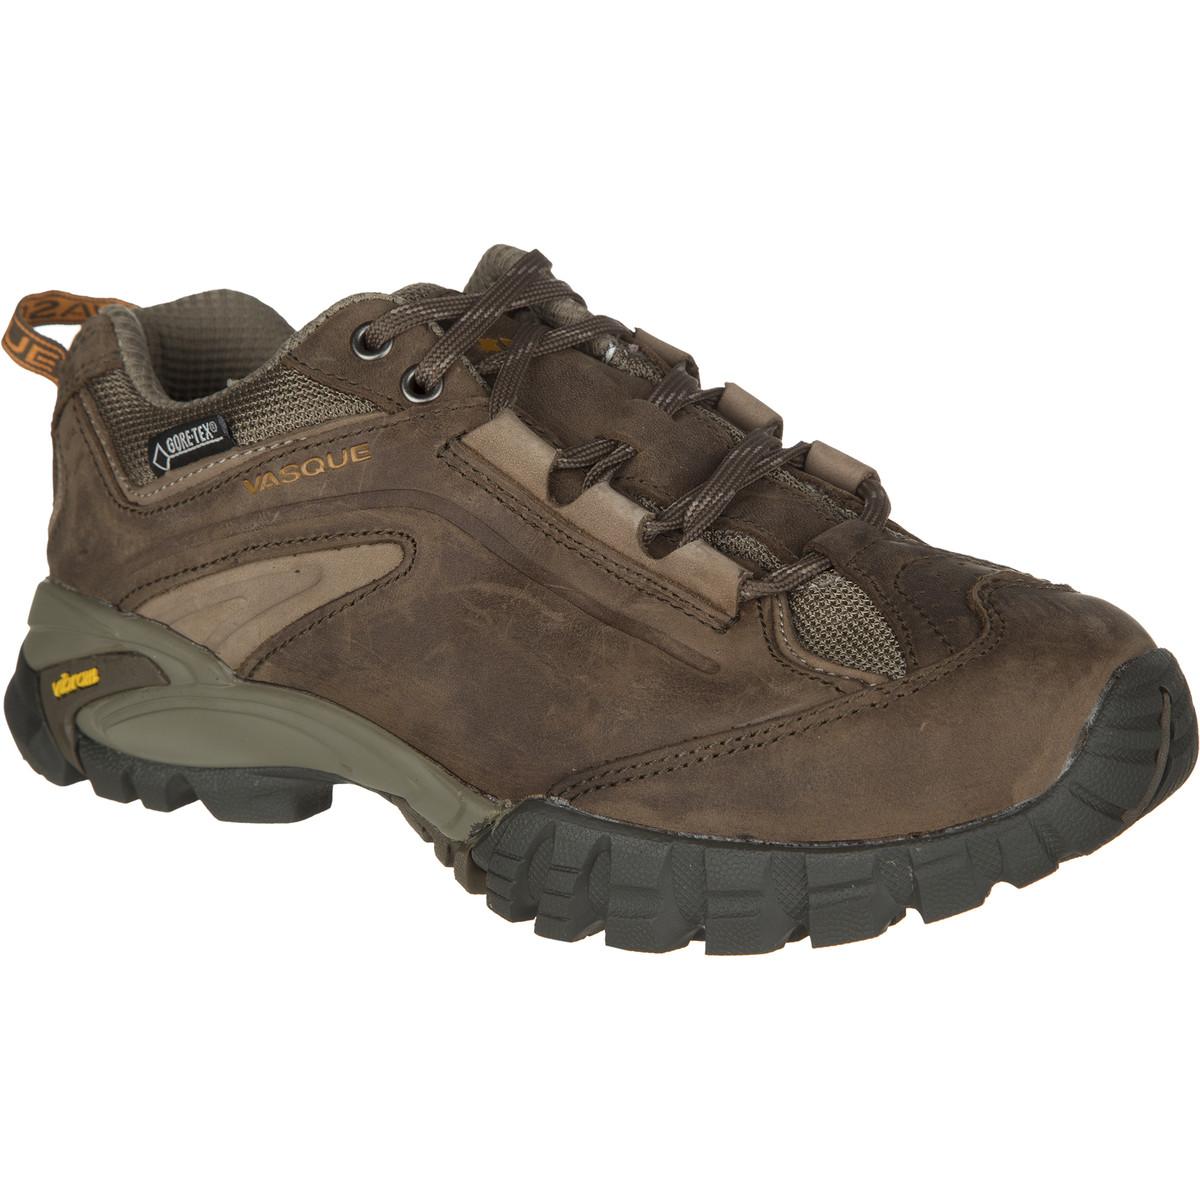 photo: Vasque Women's Mantra 2.0 GTX trail shoe